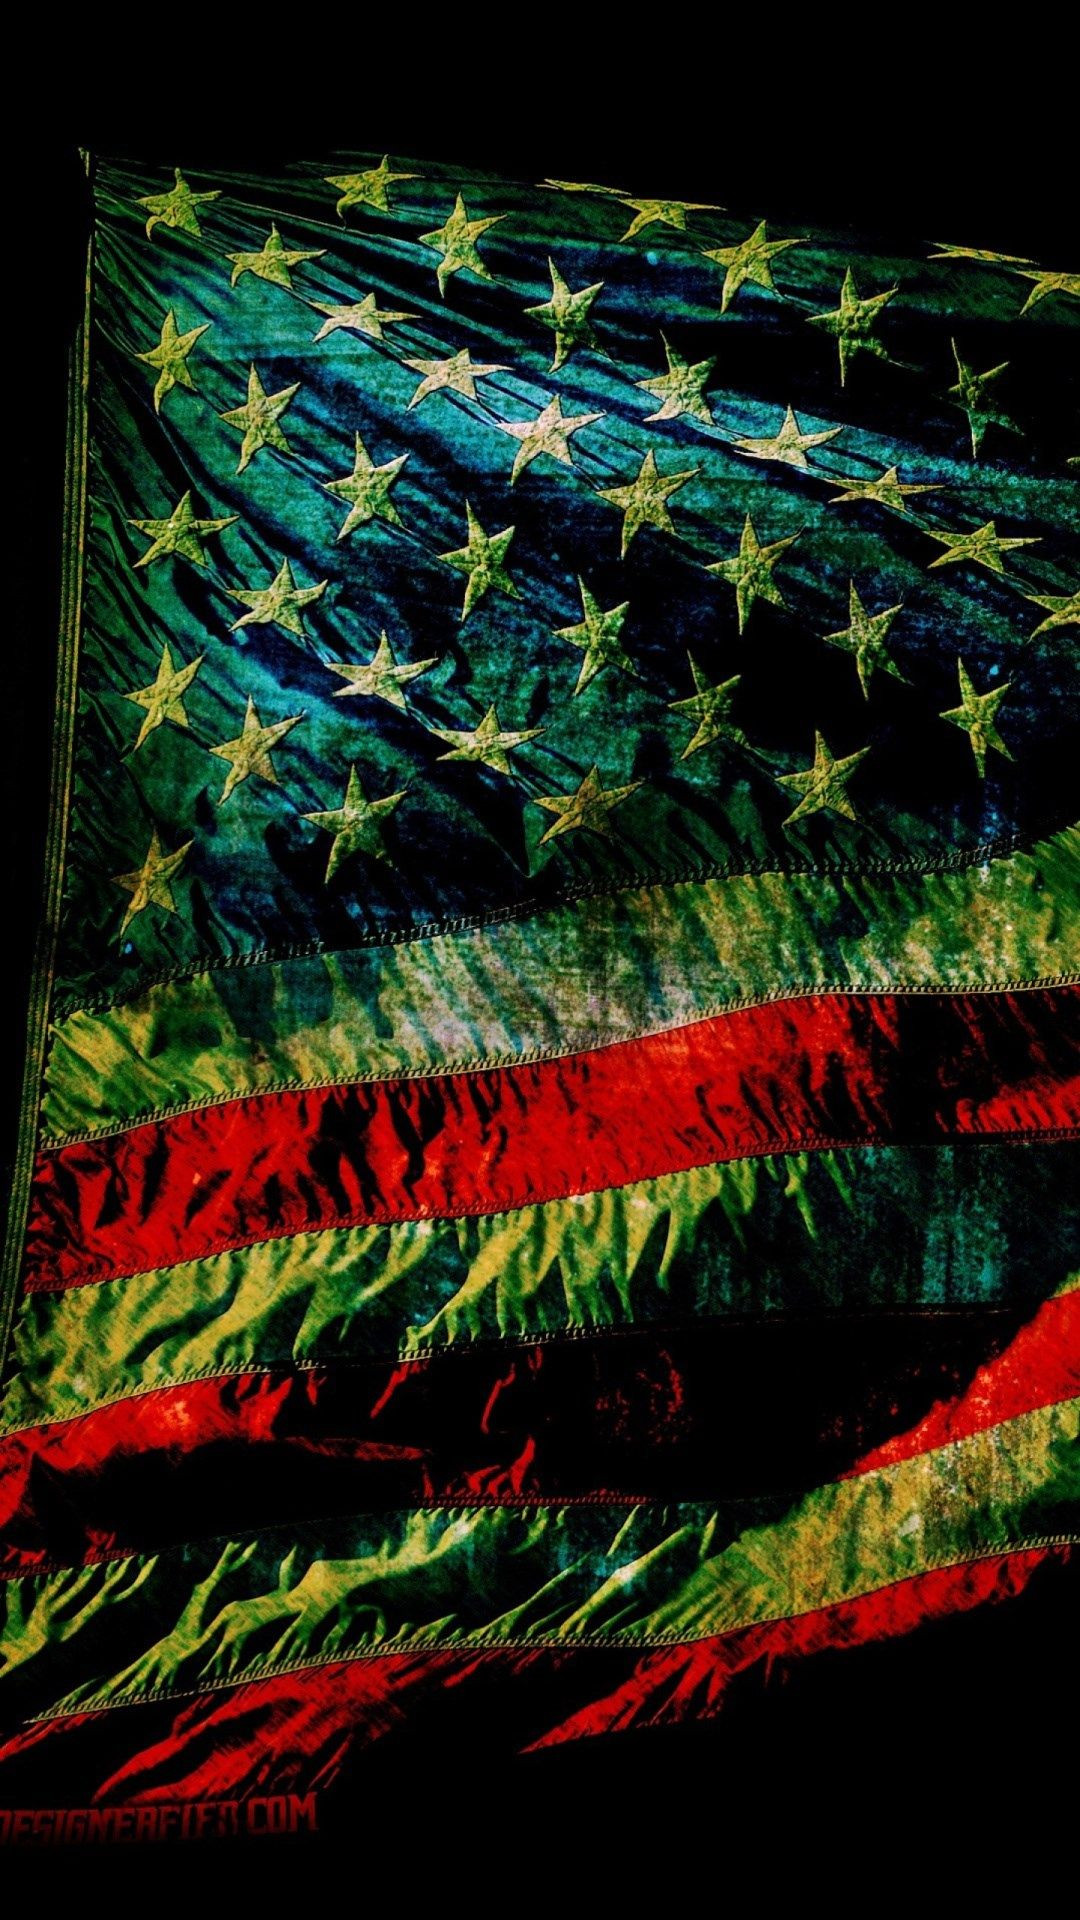 free american flag iphone wallpaper download Iphone